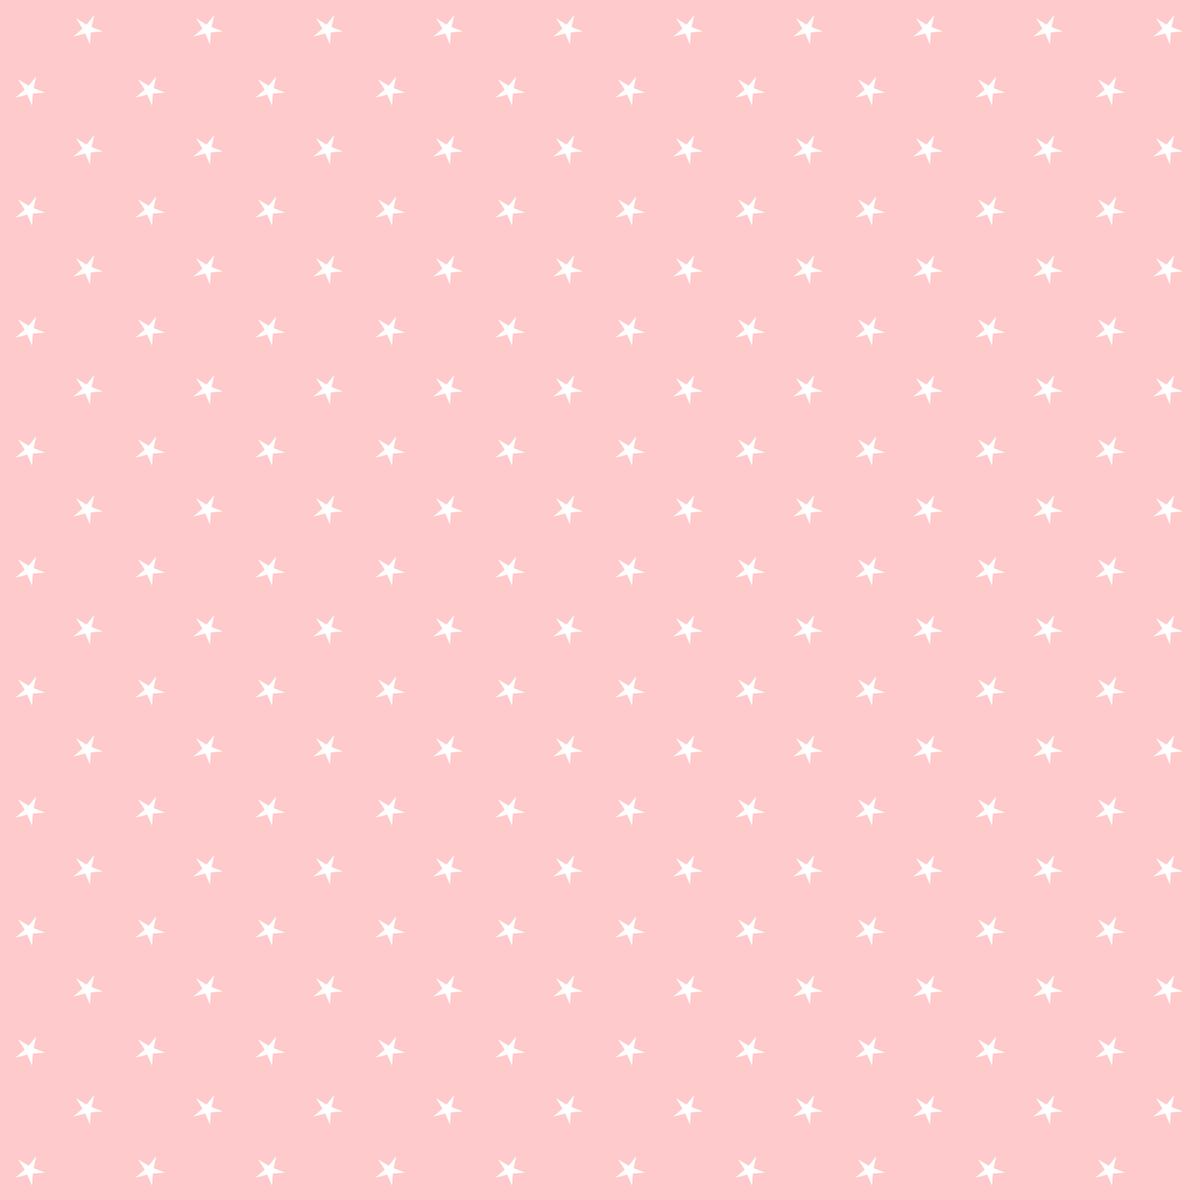 Scrapbook paper dollhouse wallpaper -  La Vie En Rose Free Printable Digital Scrapbooking Paper Polka Dot